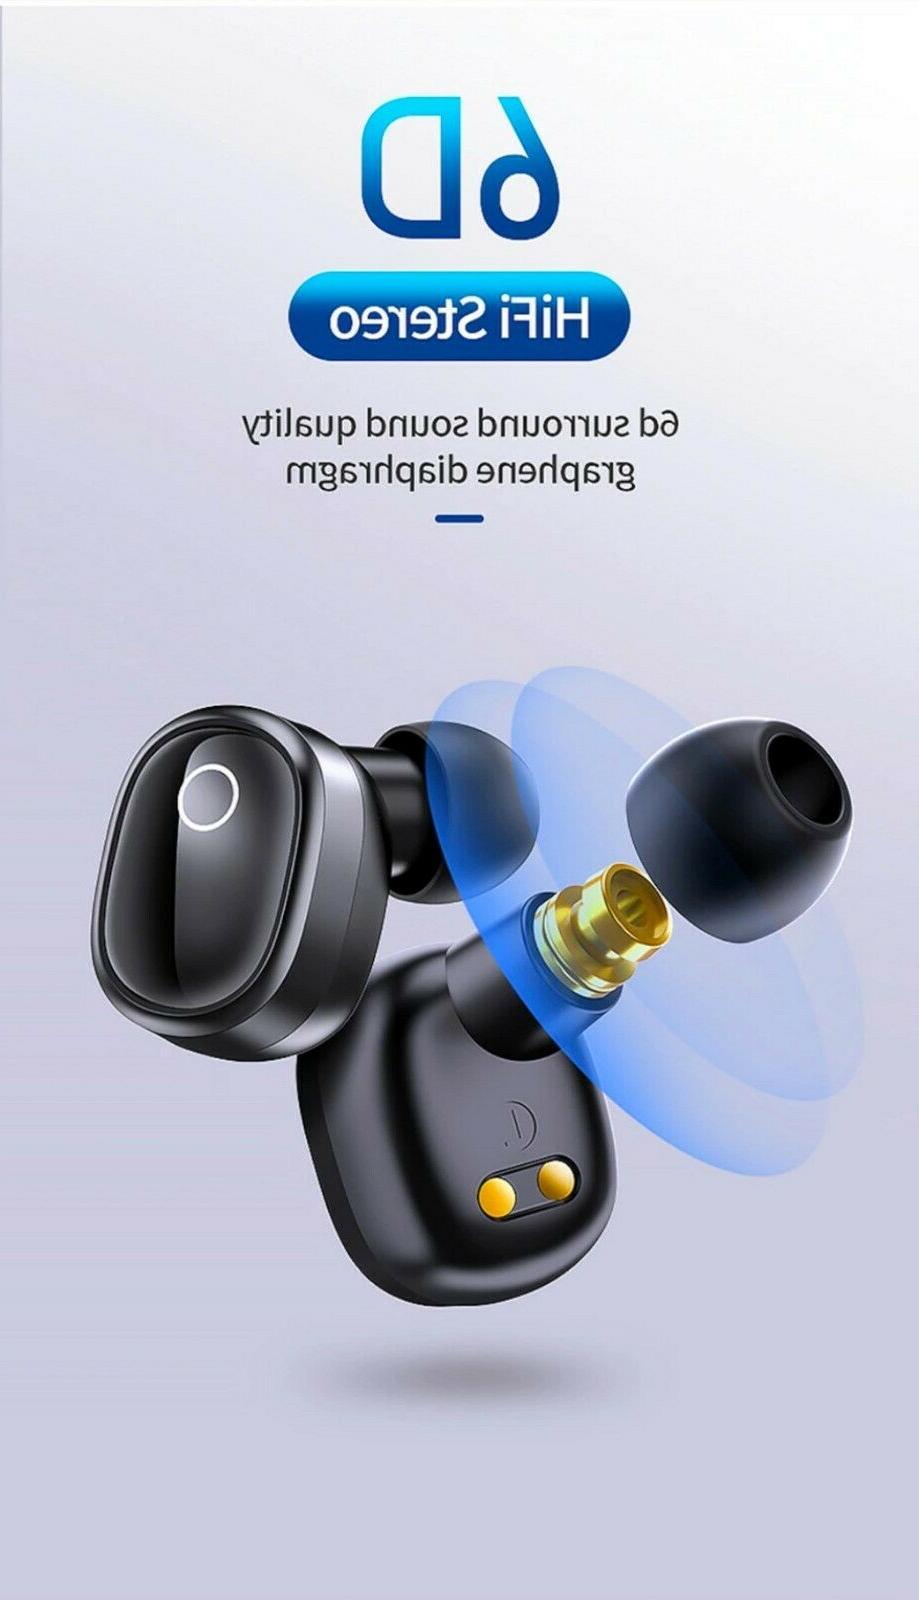 Bluetooth 5.0 Earbuds Sports Headsets Stereo Headphones Waterproof